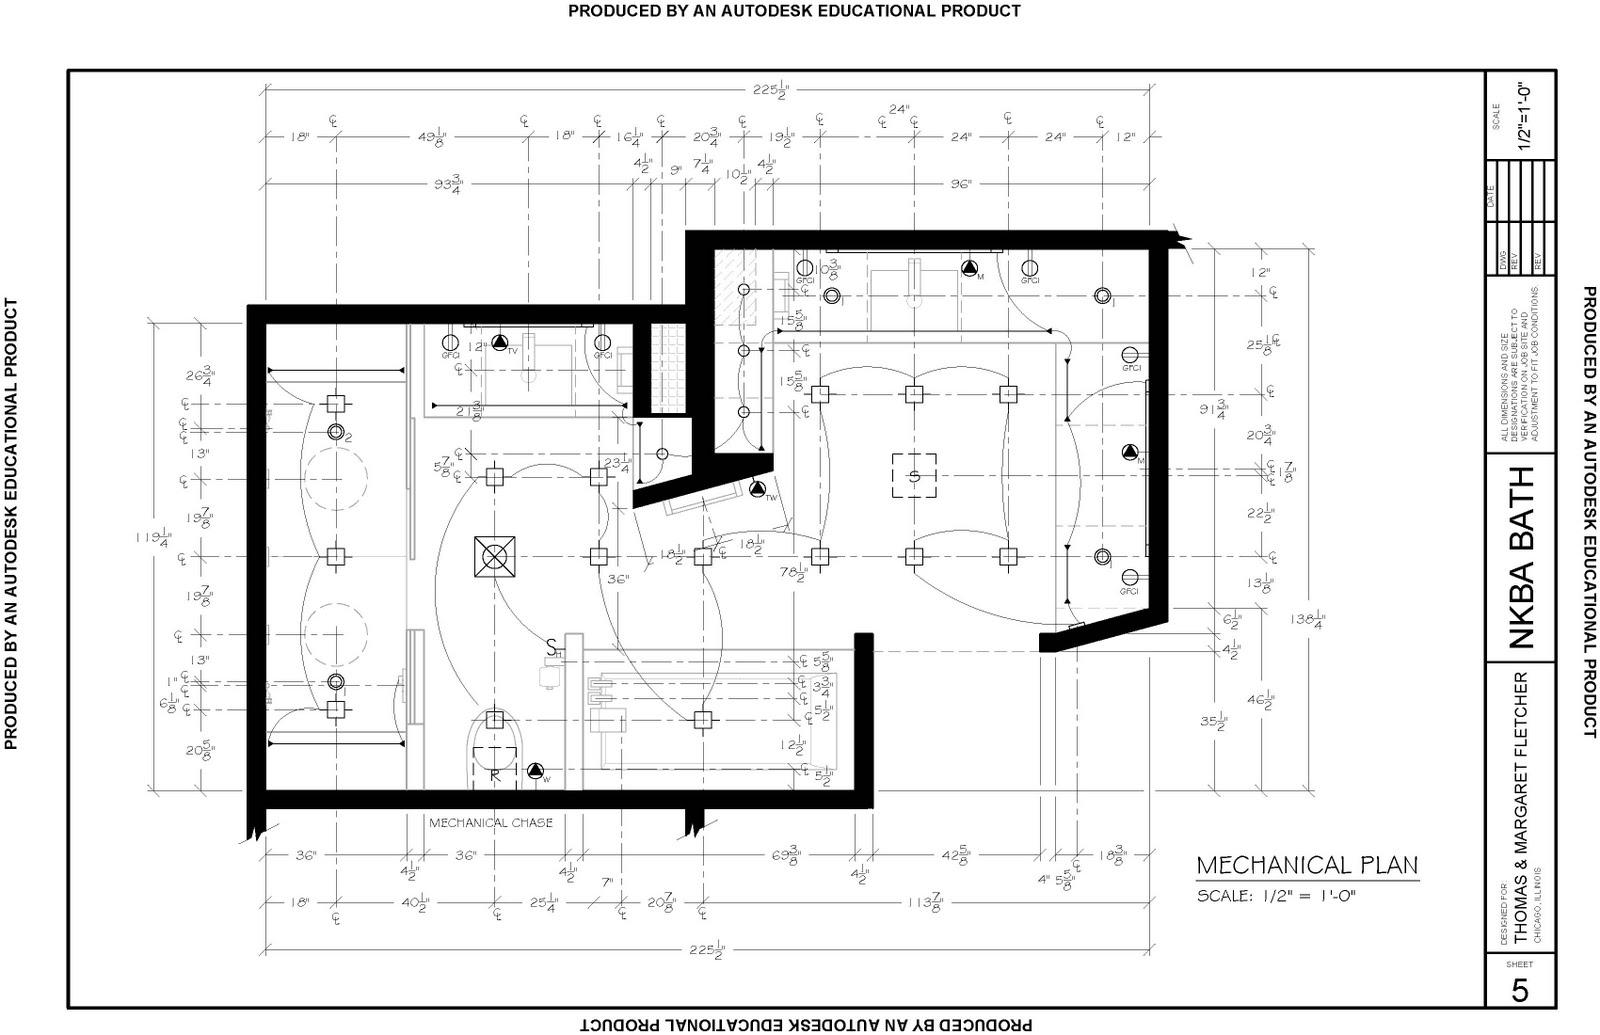 Lexus Home Page | Wiring Diagram Database